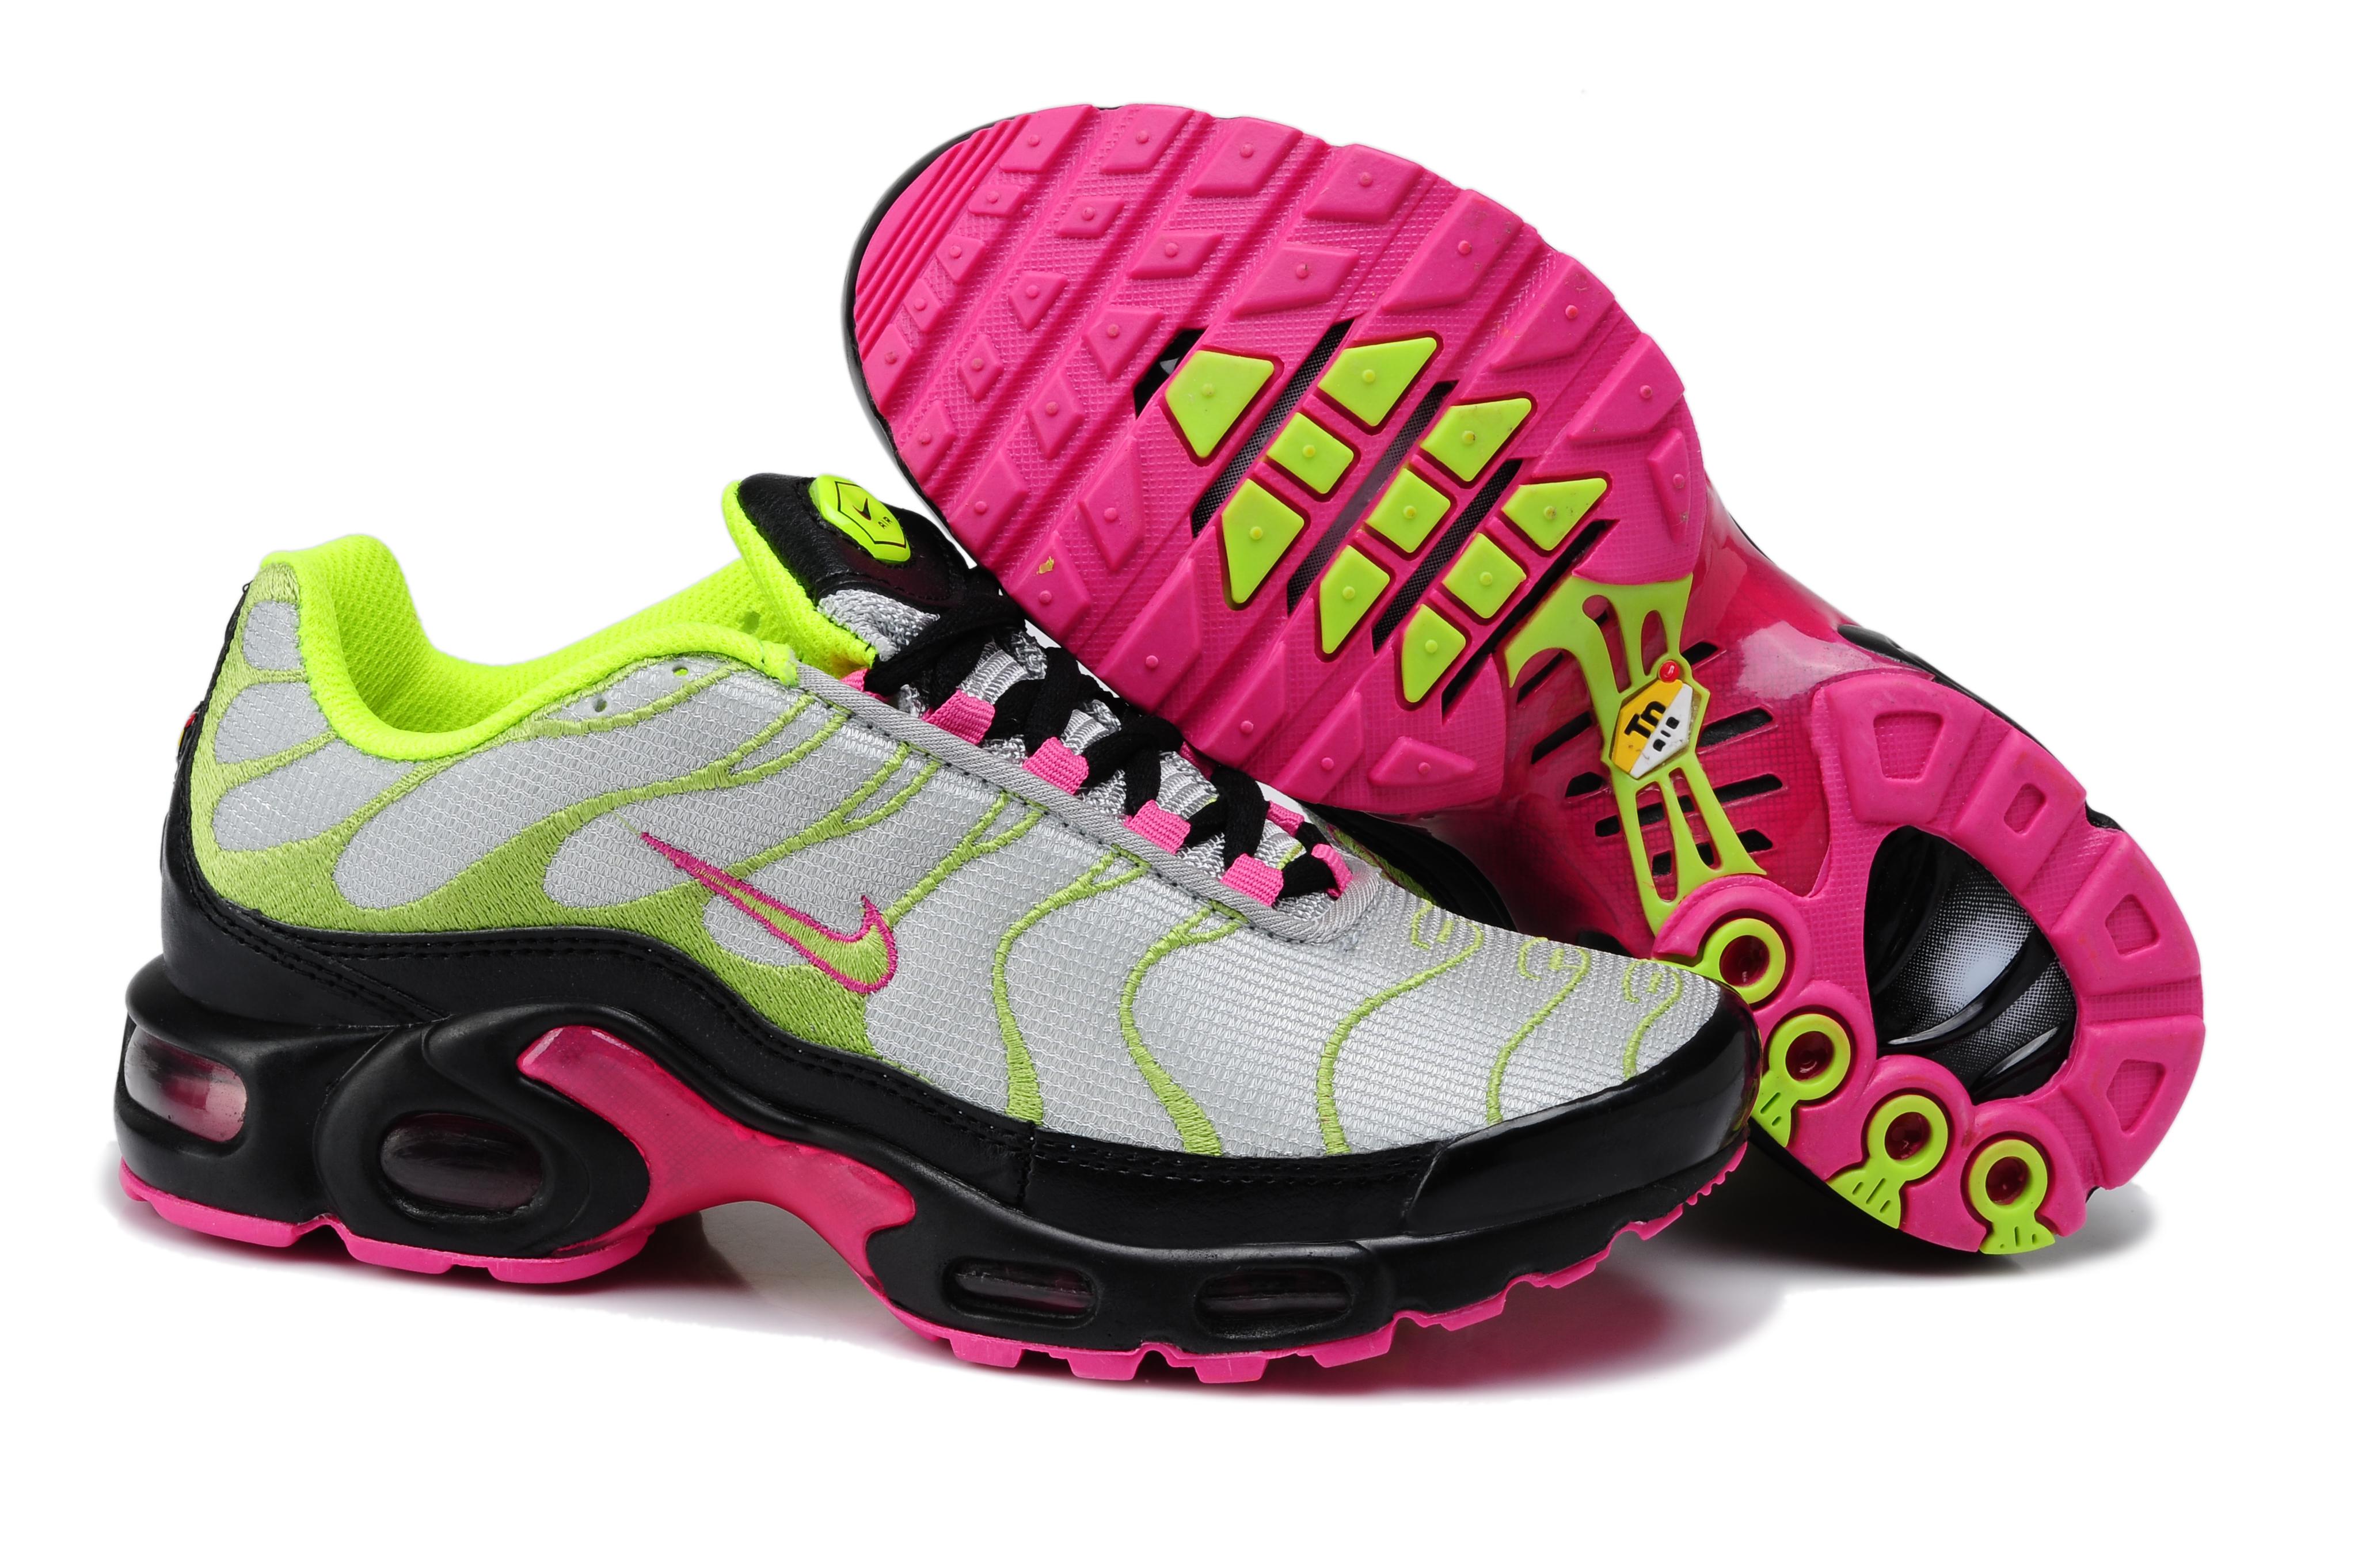 info pour 0b695 40e29 chaussures nike femme air max cage printemps 2014,achat ...